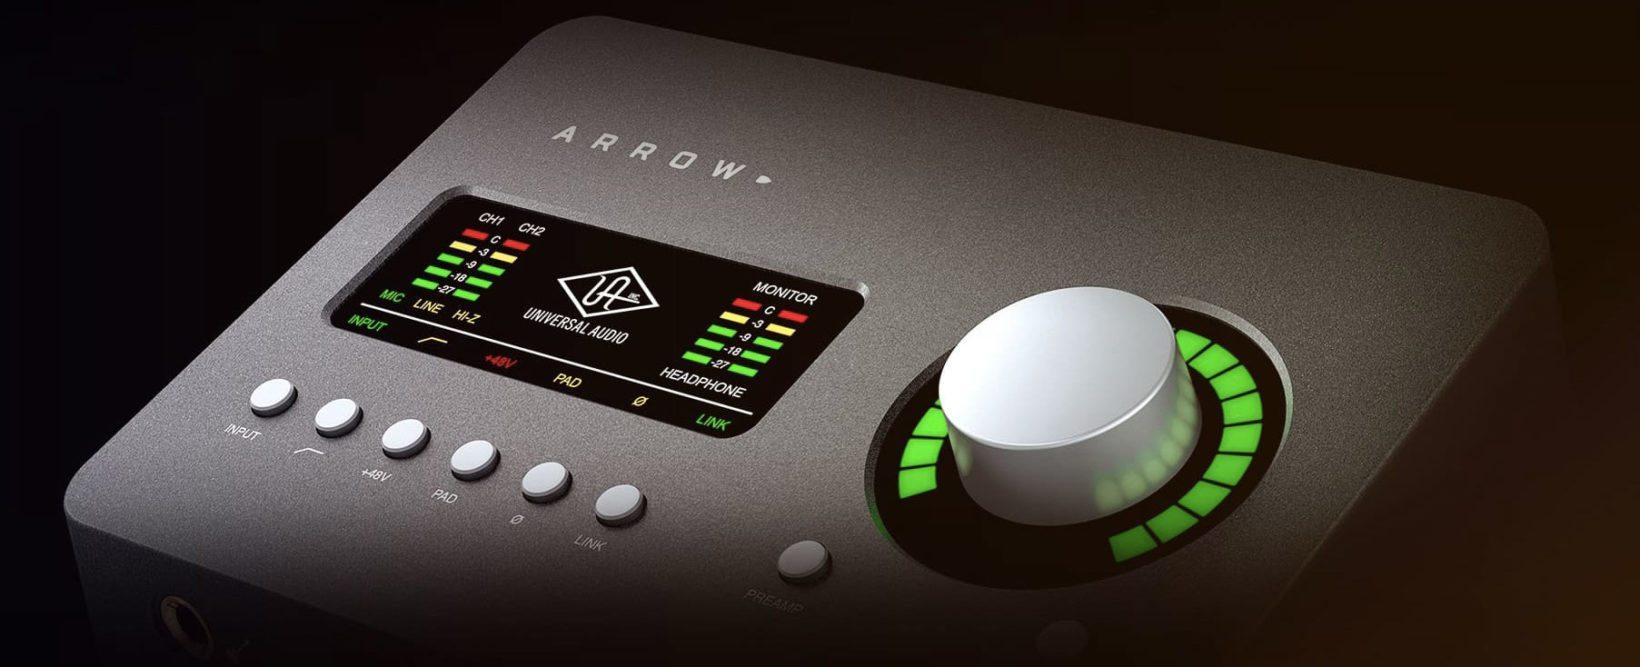 interfaccia audio Thunderbolt 3 - foto Arrow Thunderbolt 3